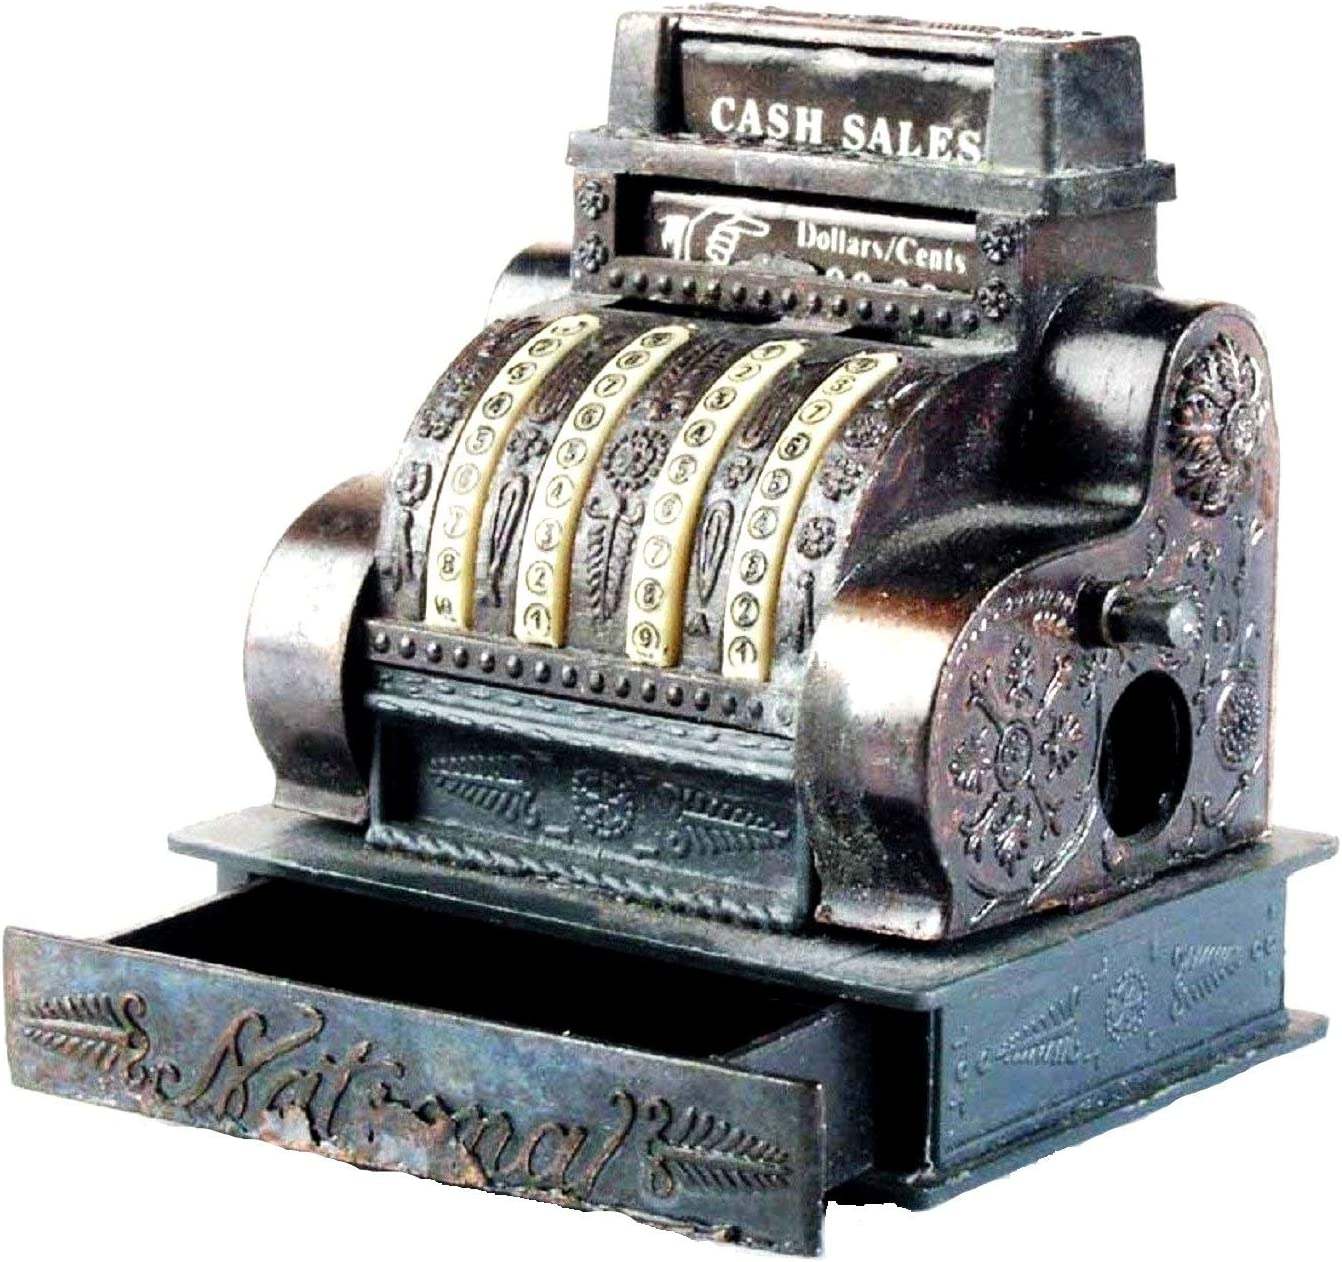 Old Time Cash Register Die Sharpen Pencil Direct Superlatite sale of manufacturer Metal Collectible Cast